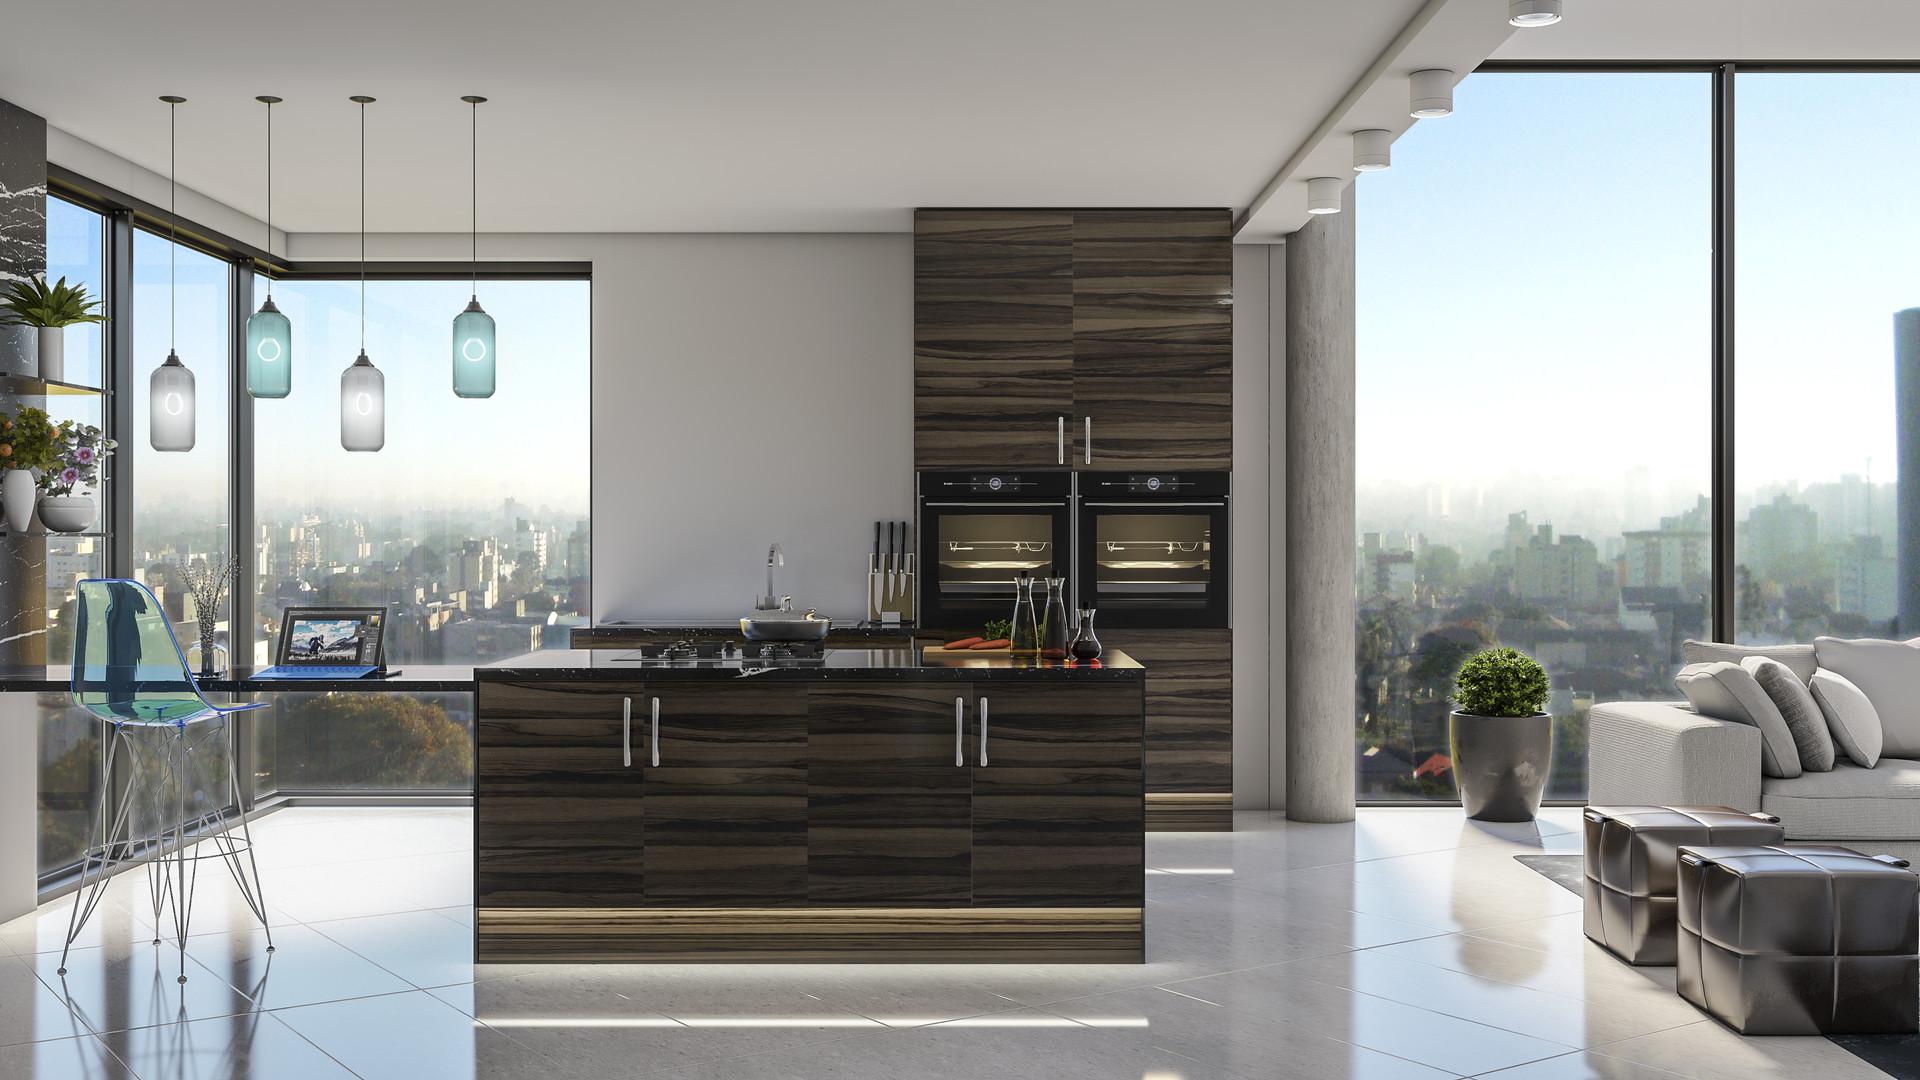 Lucy Kisielewska Japanese Pear Modern Apartment Kitchen Design